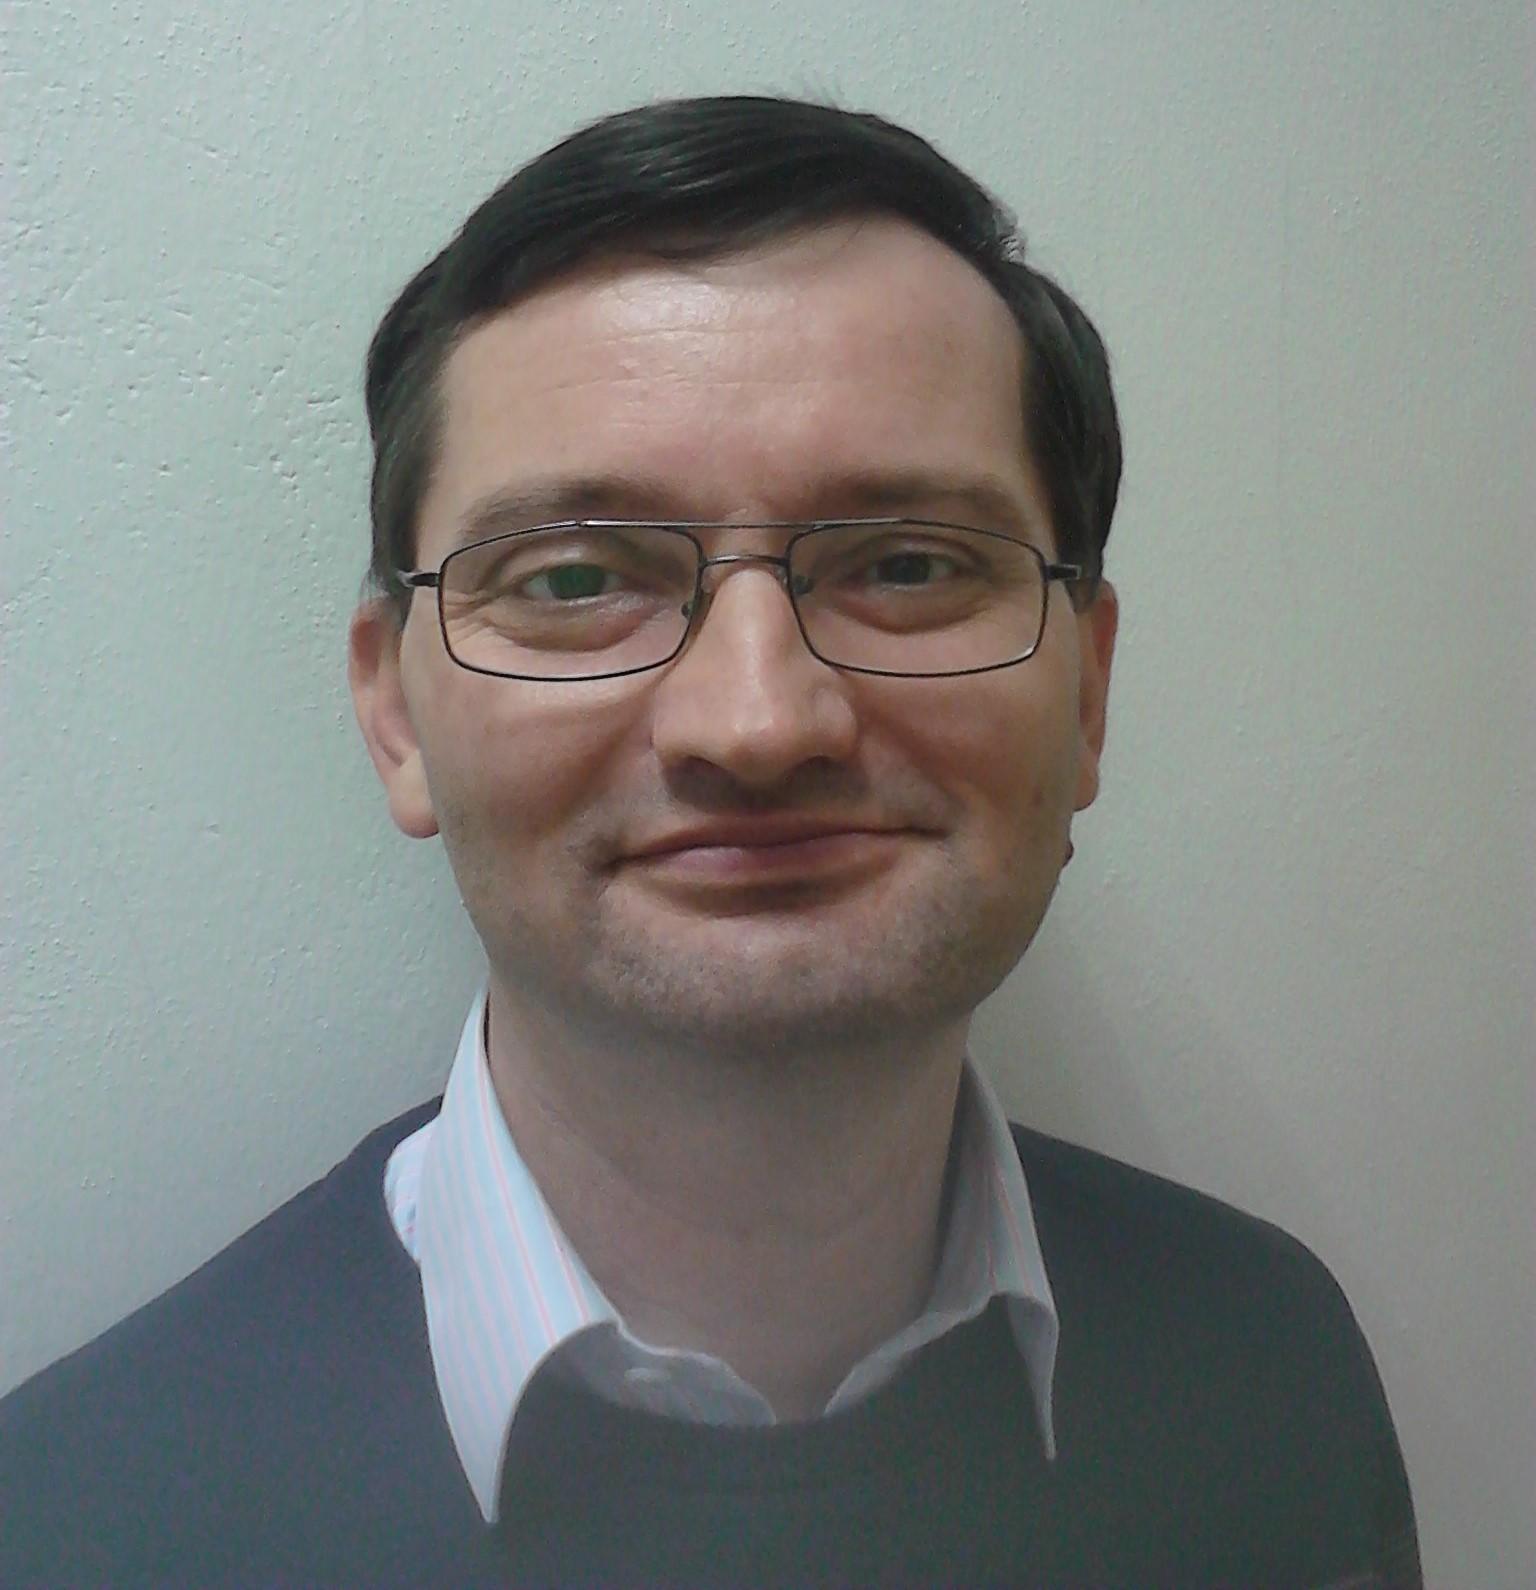 PharmDr. Tomáš Arndt, Ph.D. poodhaluje tajemství produktů ESTHECEUTI®